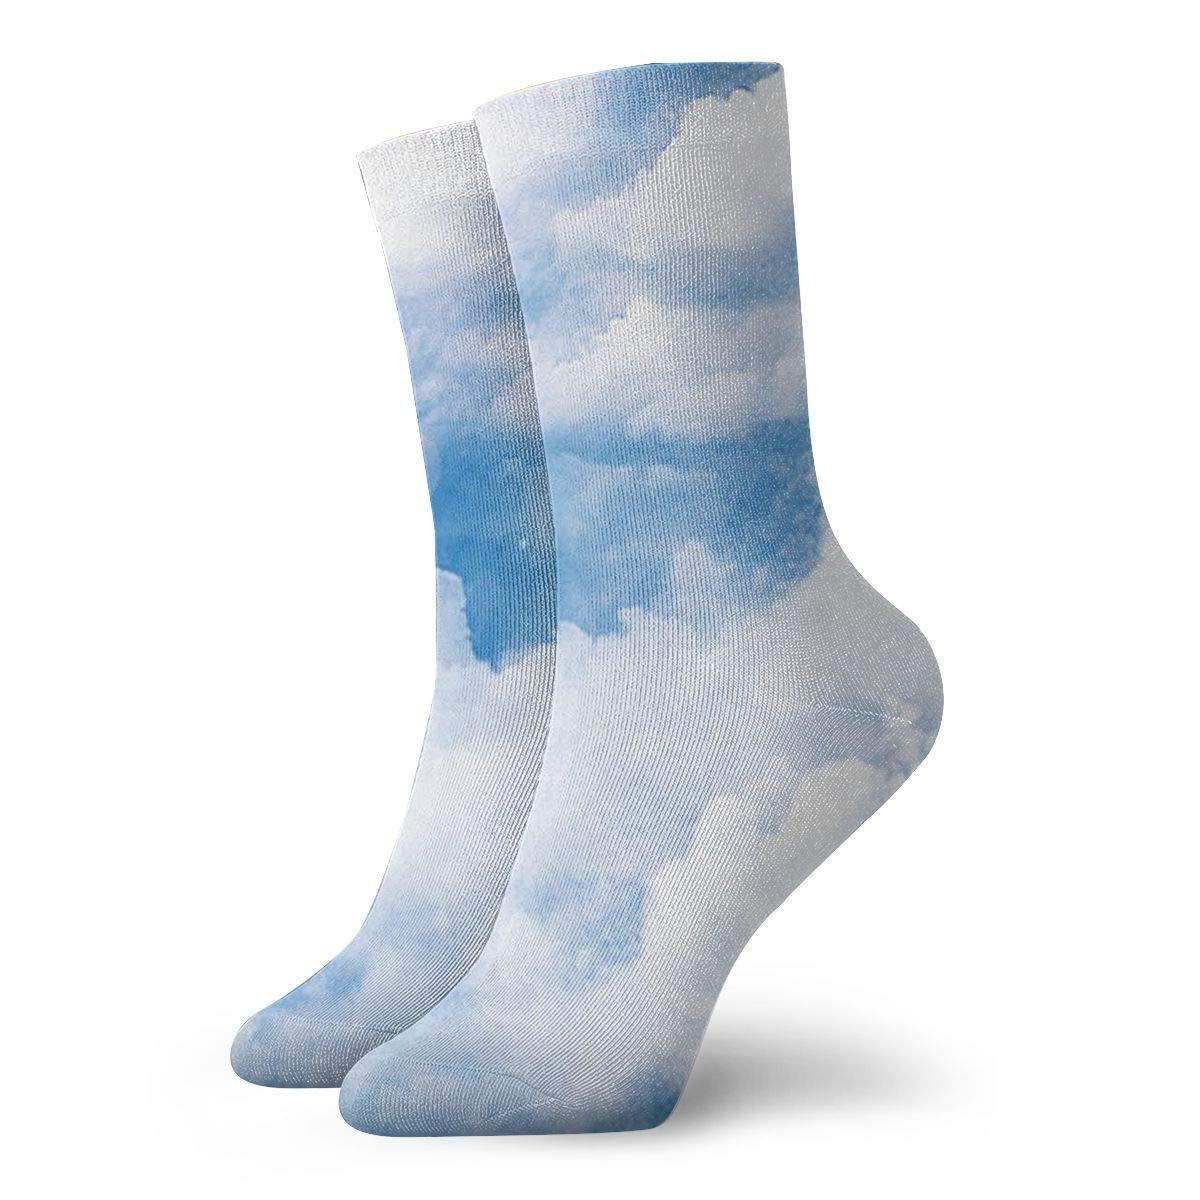 Cloud-sky Unisex Funny Casual Crew Socks Athletic Socks For Boys Girls Kids Teenagers